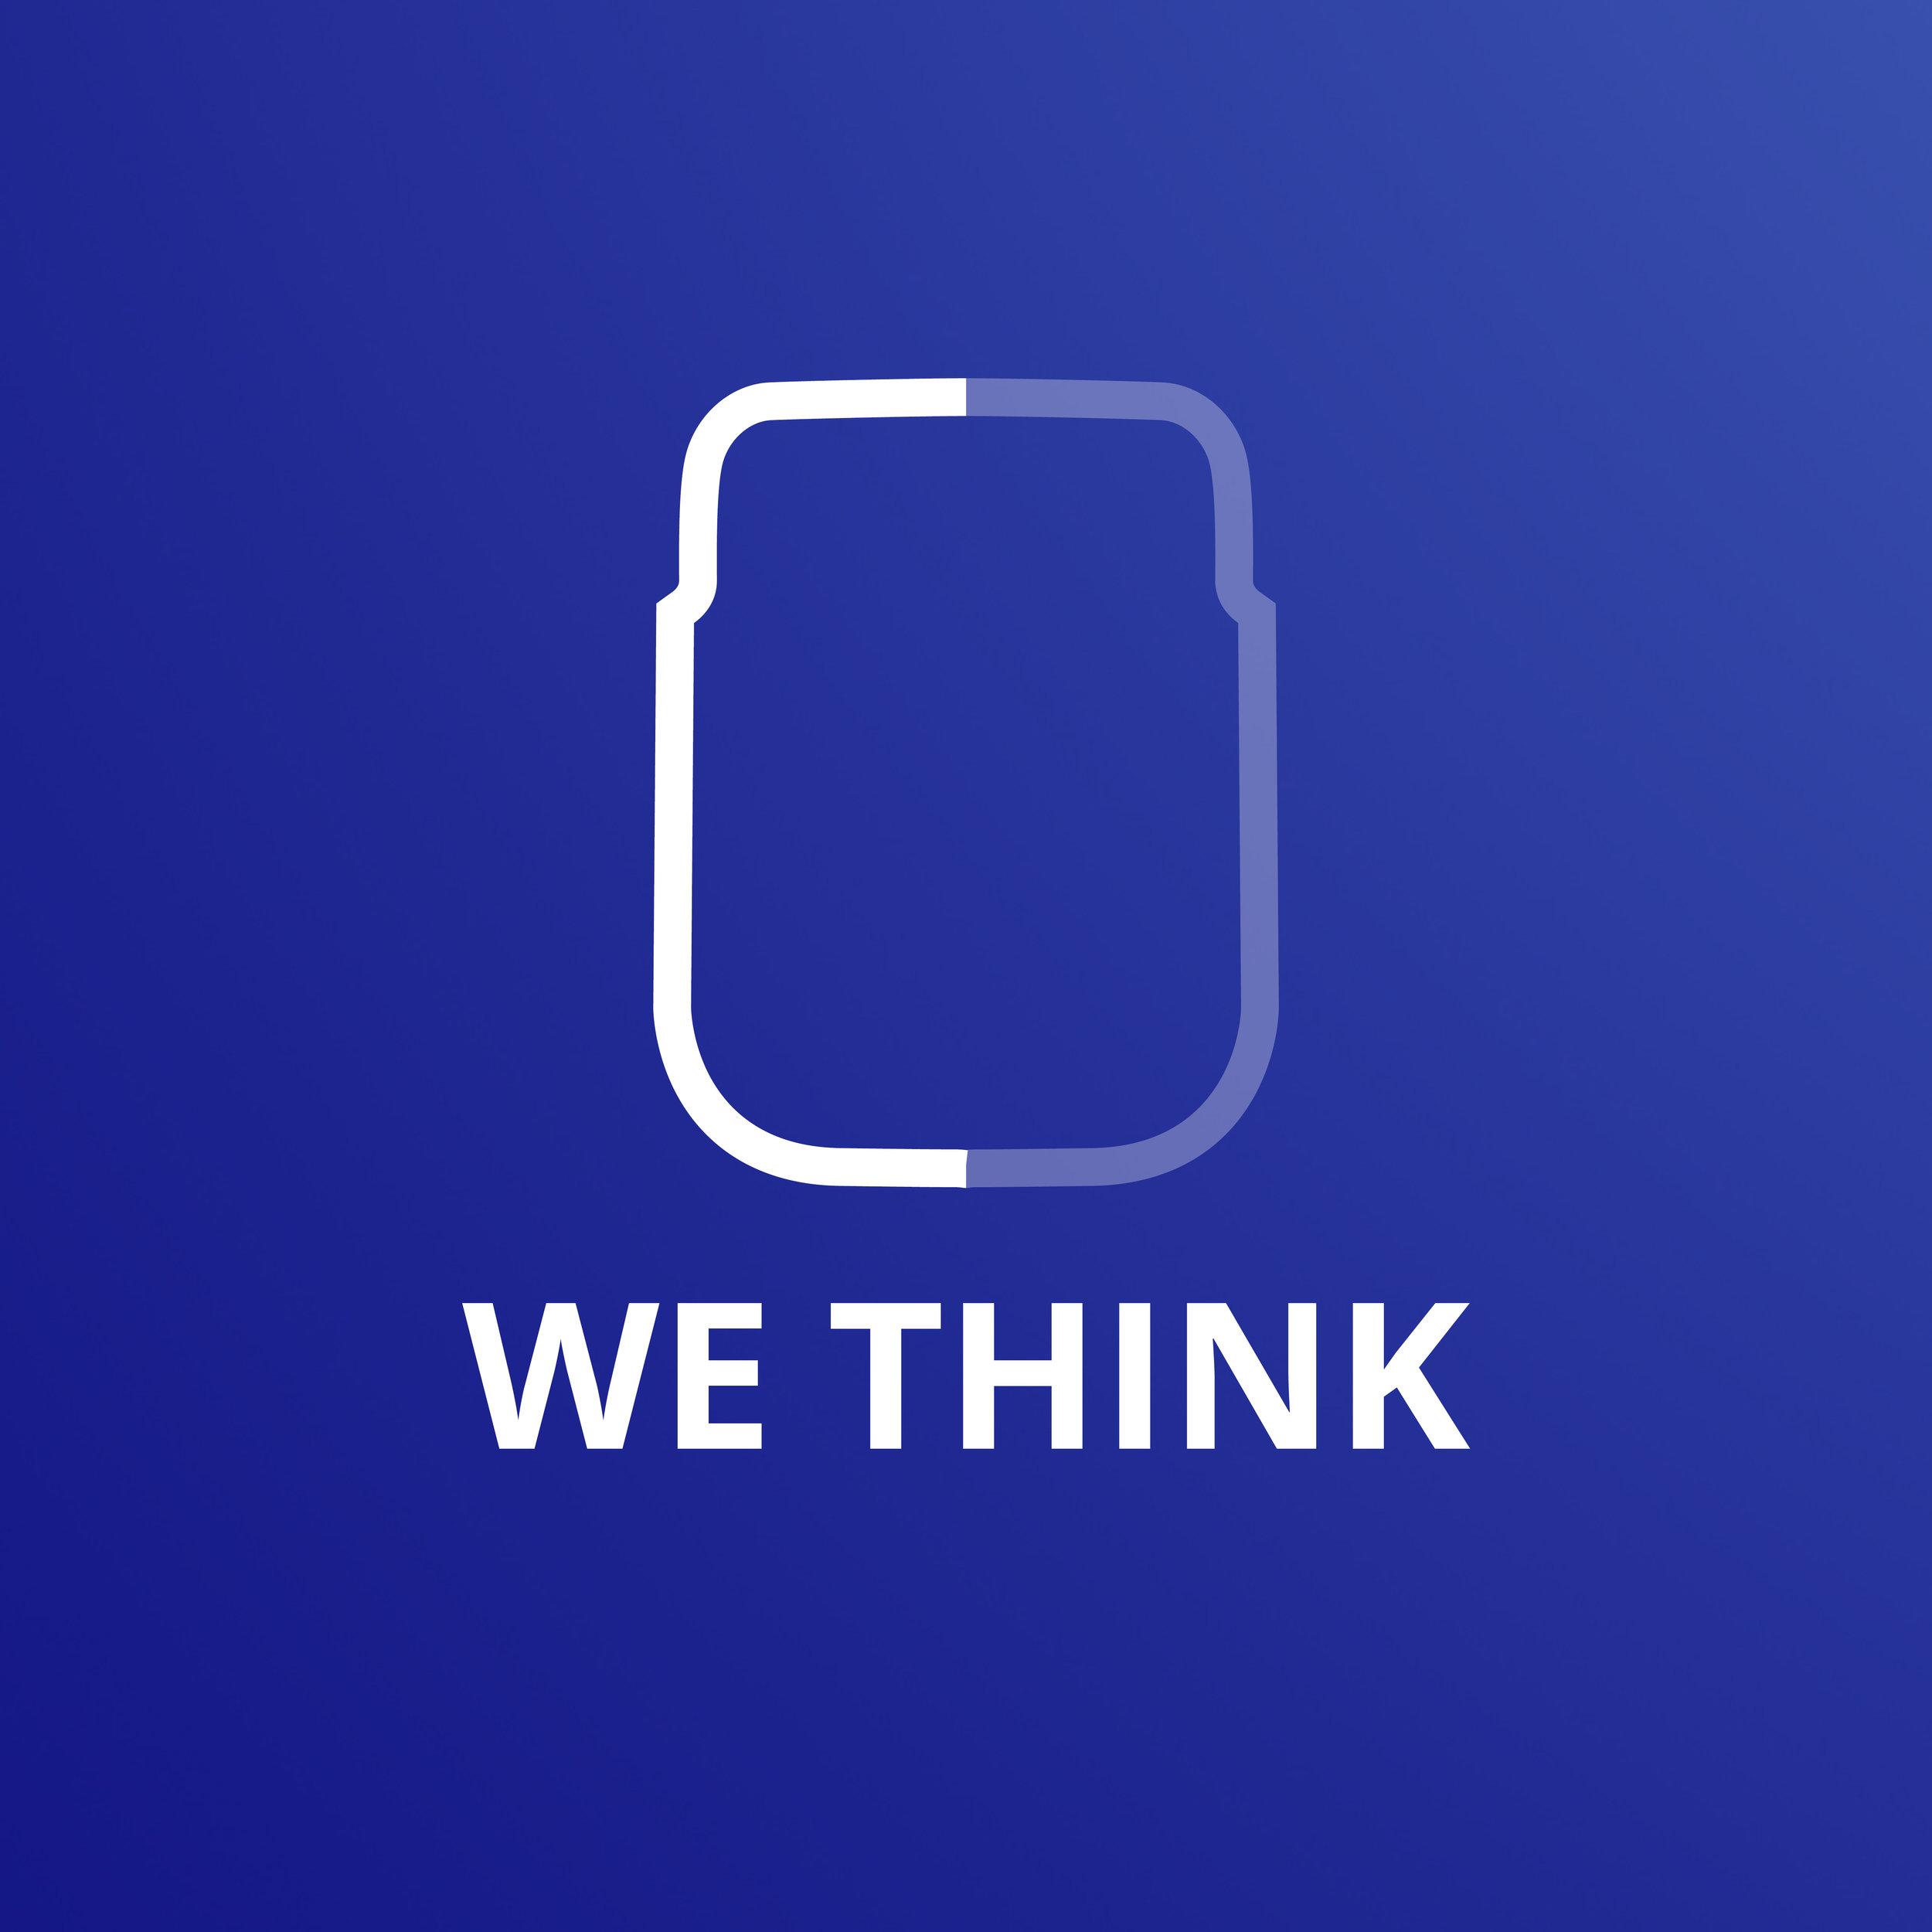 We Think-01.jpg